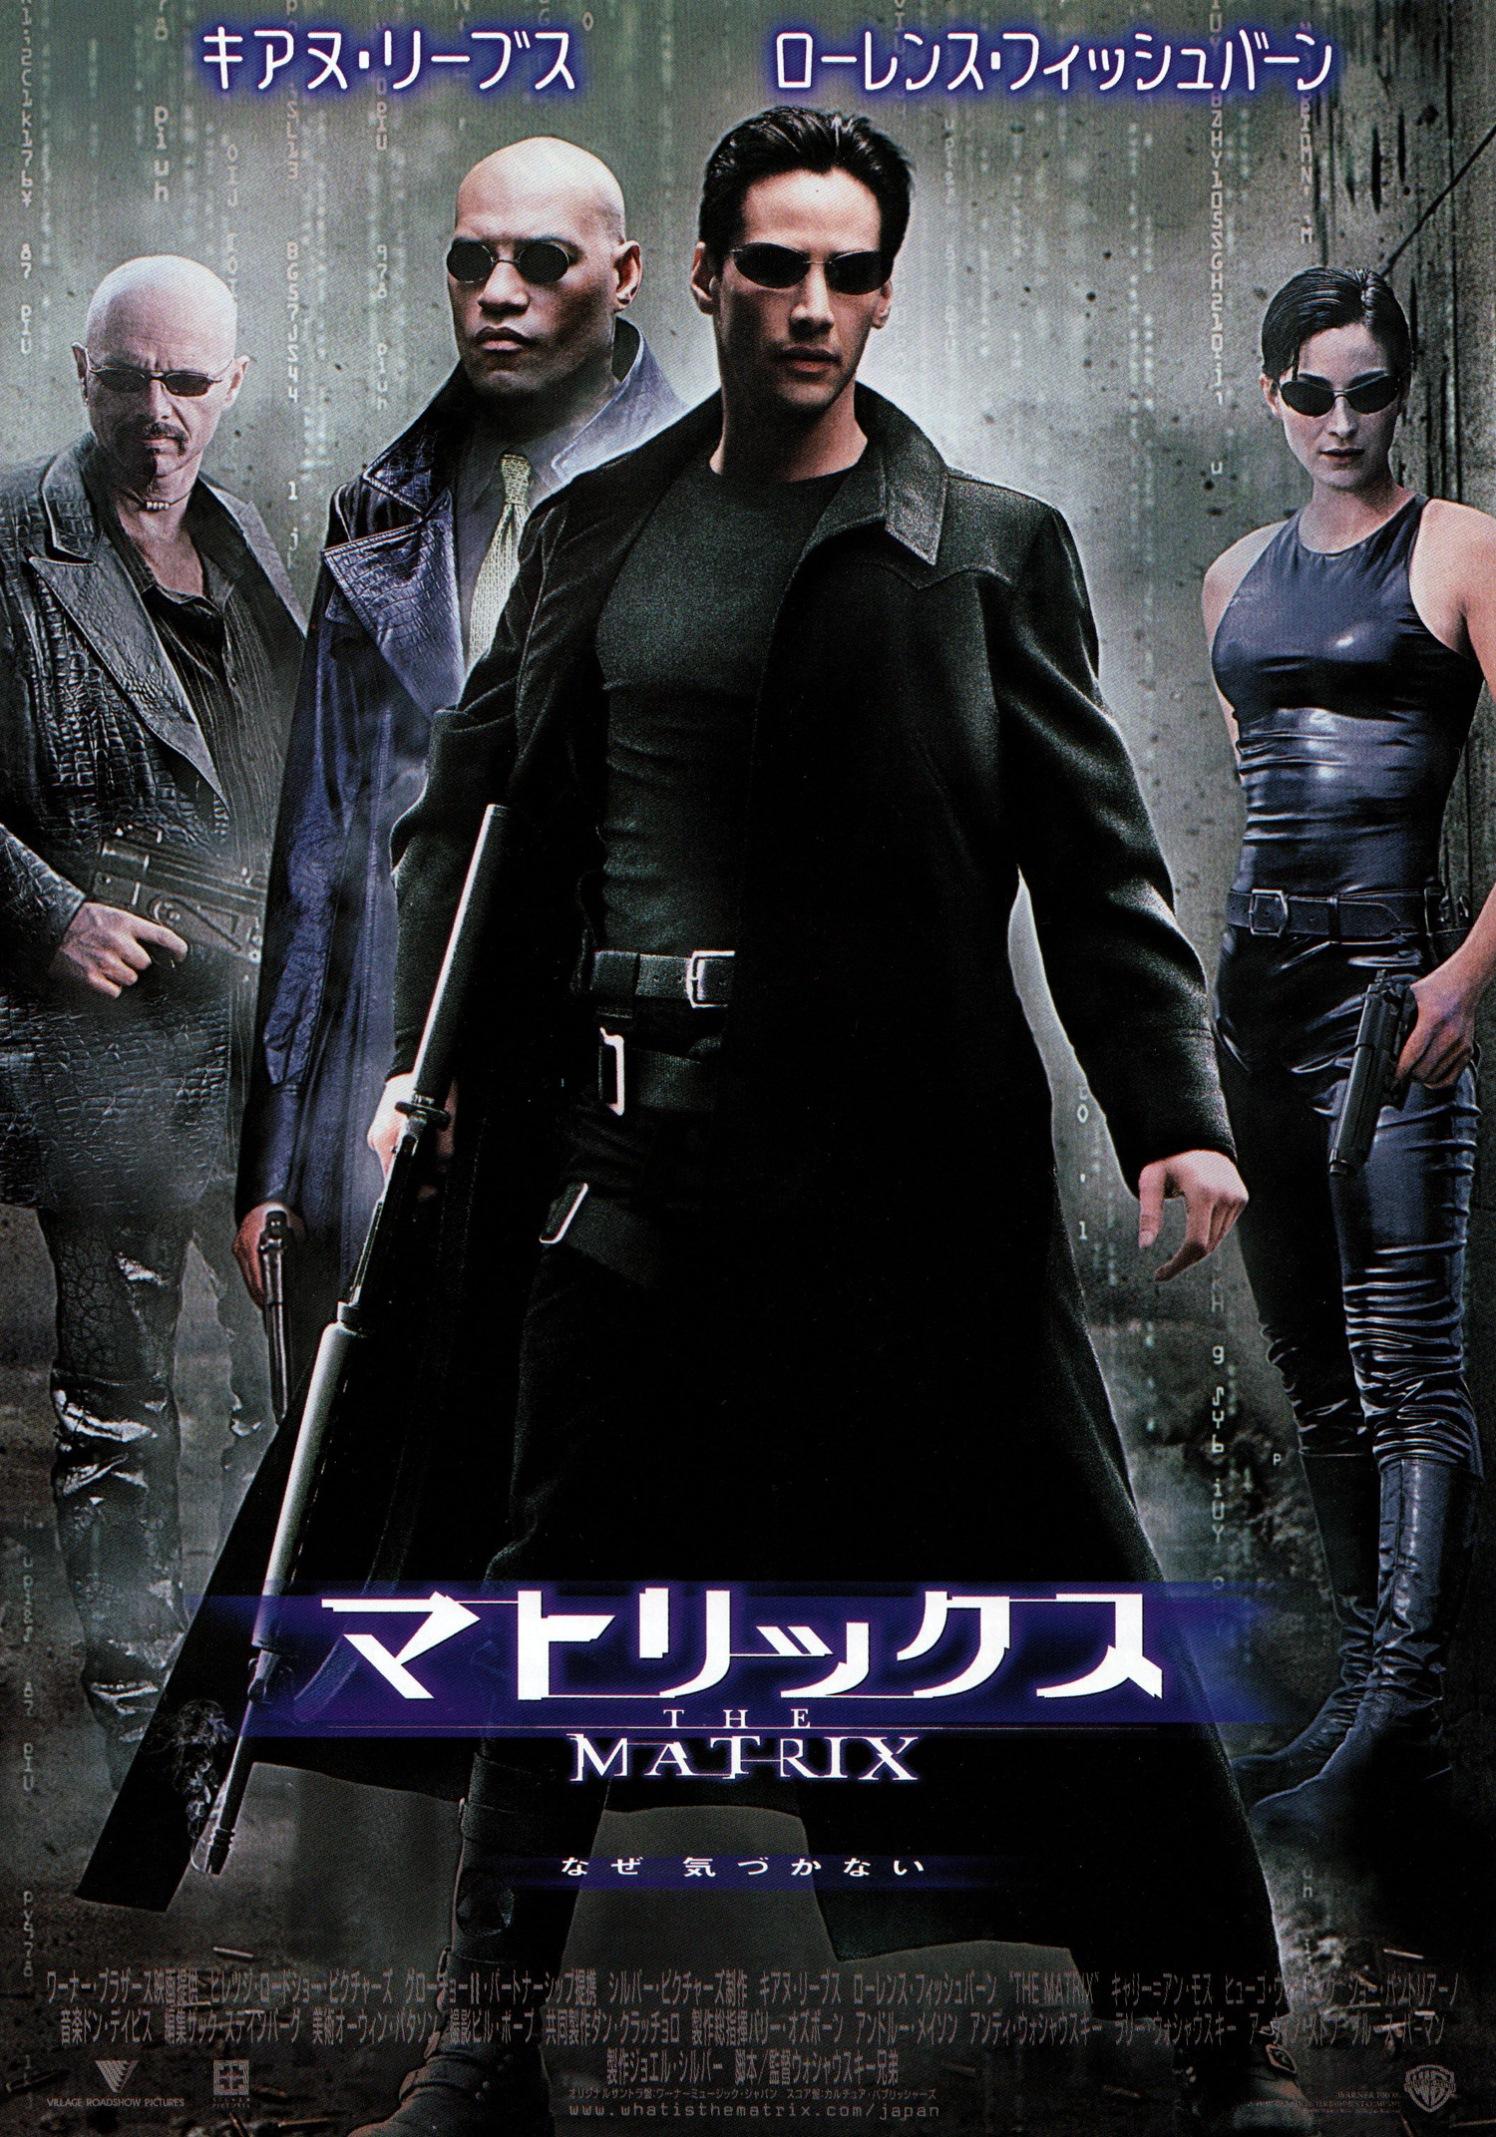 matrix-japan-1